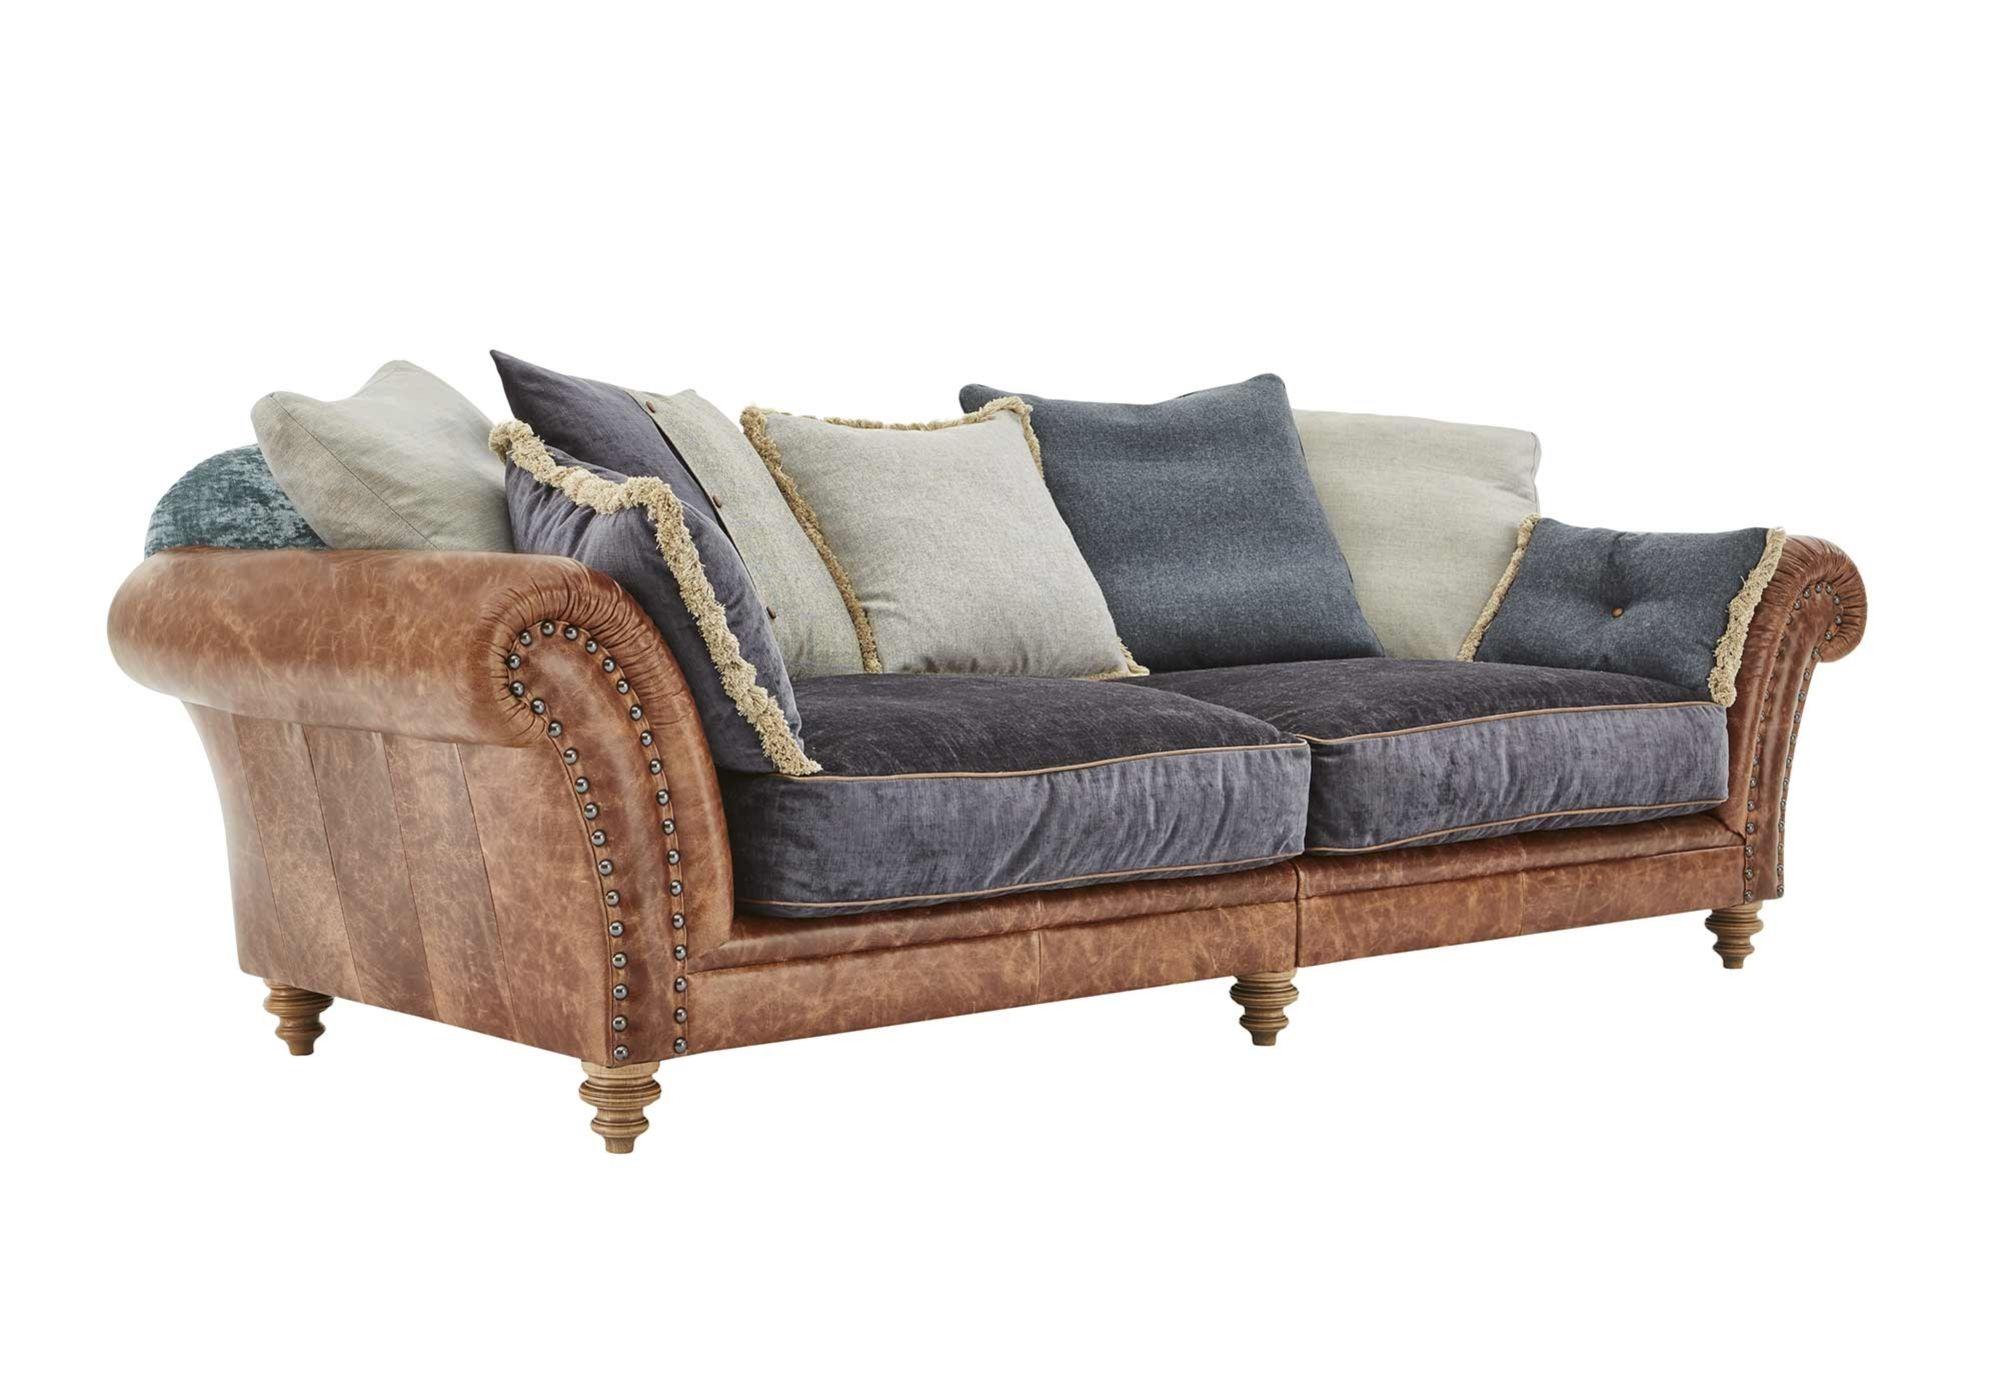 4 Seater Split Frame Leather Sofa Westwood Living room